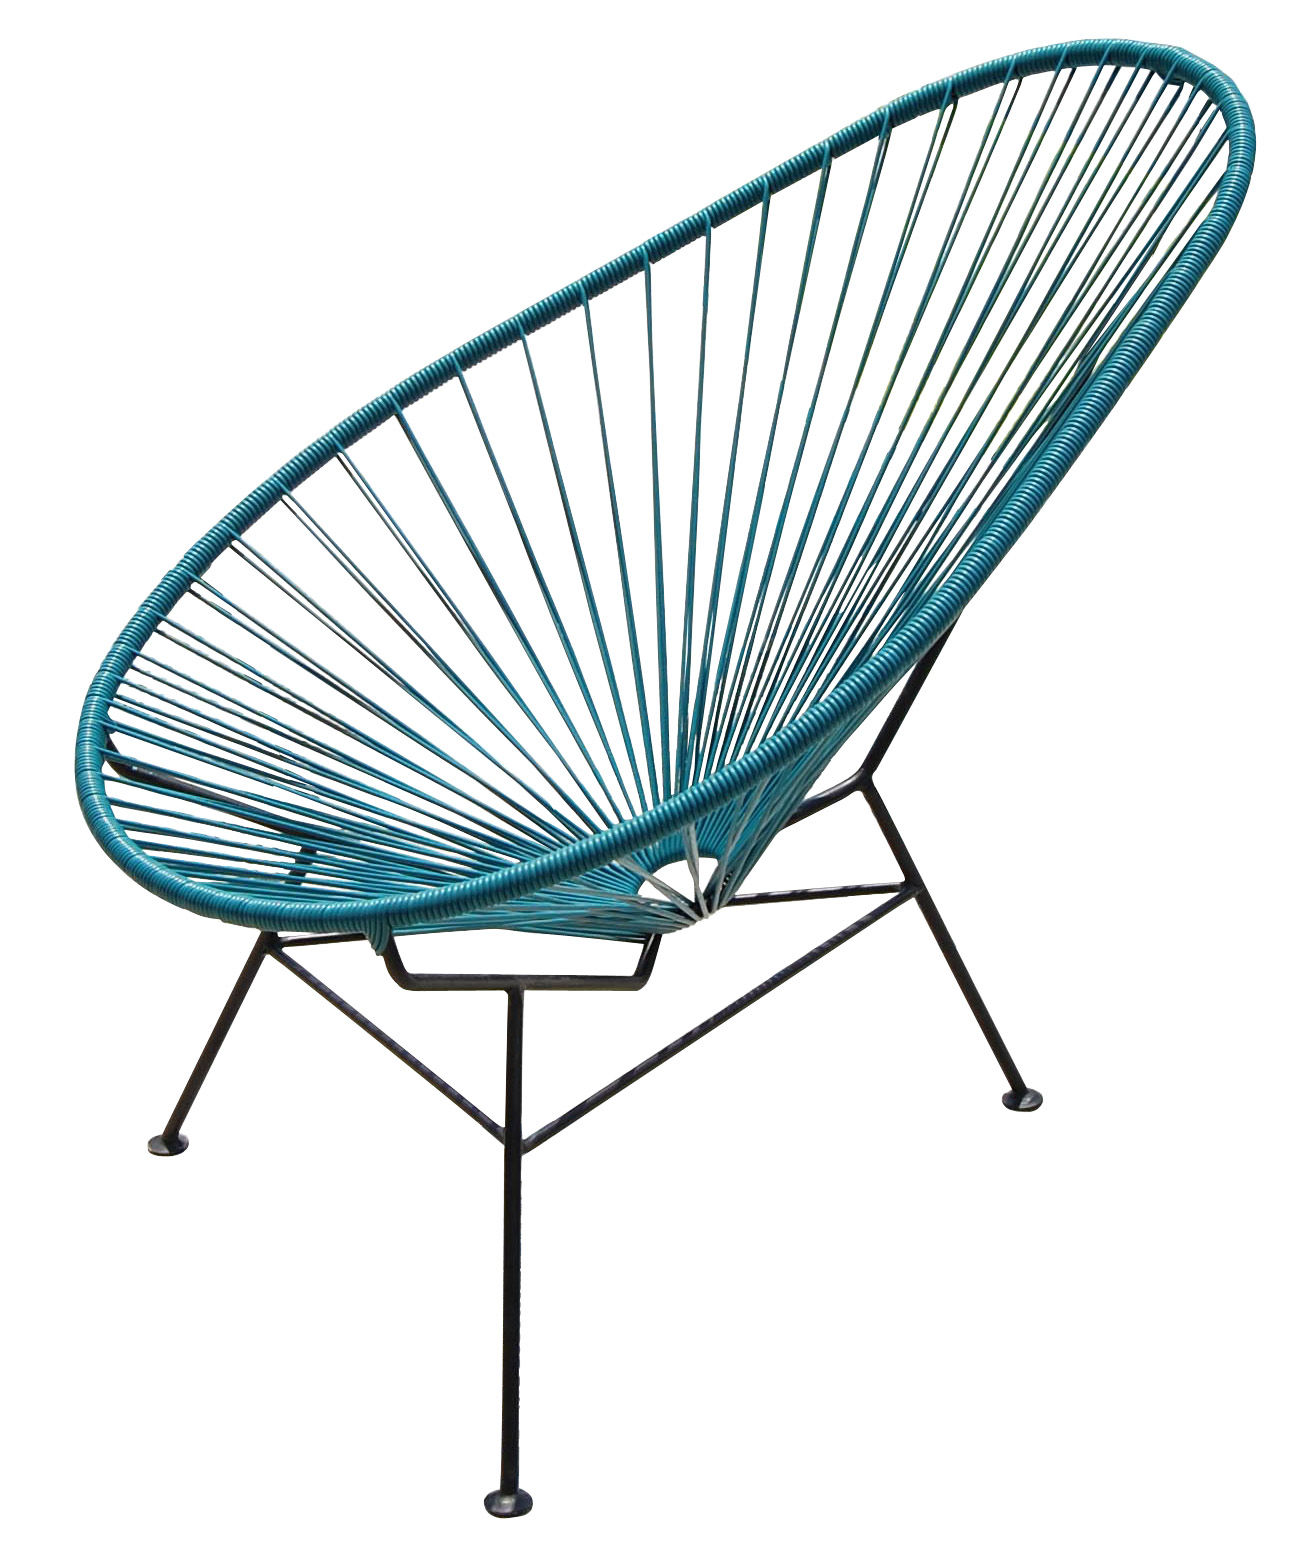 acapulco low armchair petrol blue by ok design pour sentou edition. Black Bedroom Furniture Sets. Home Design Ideas